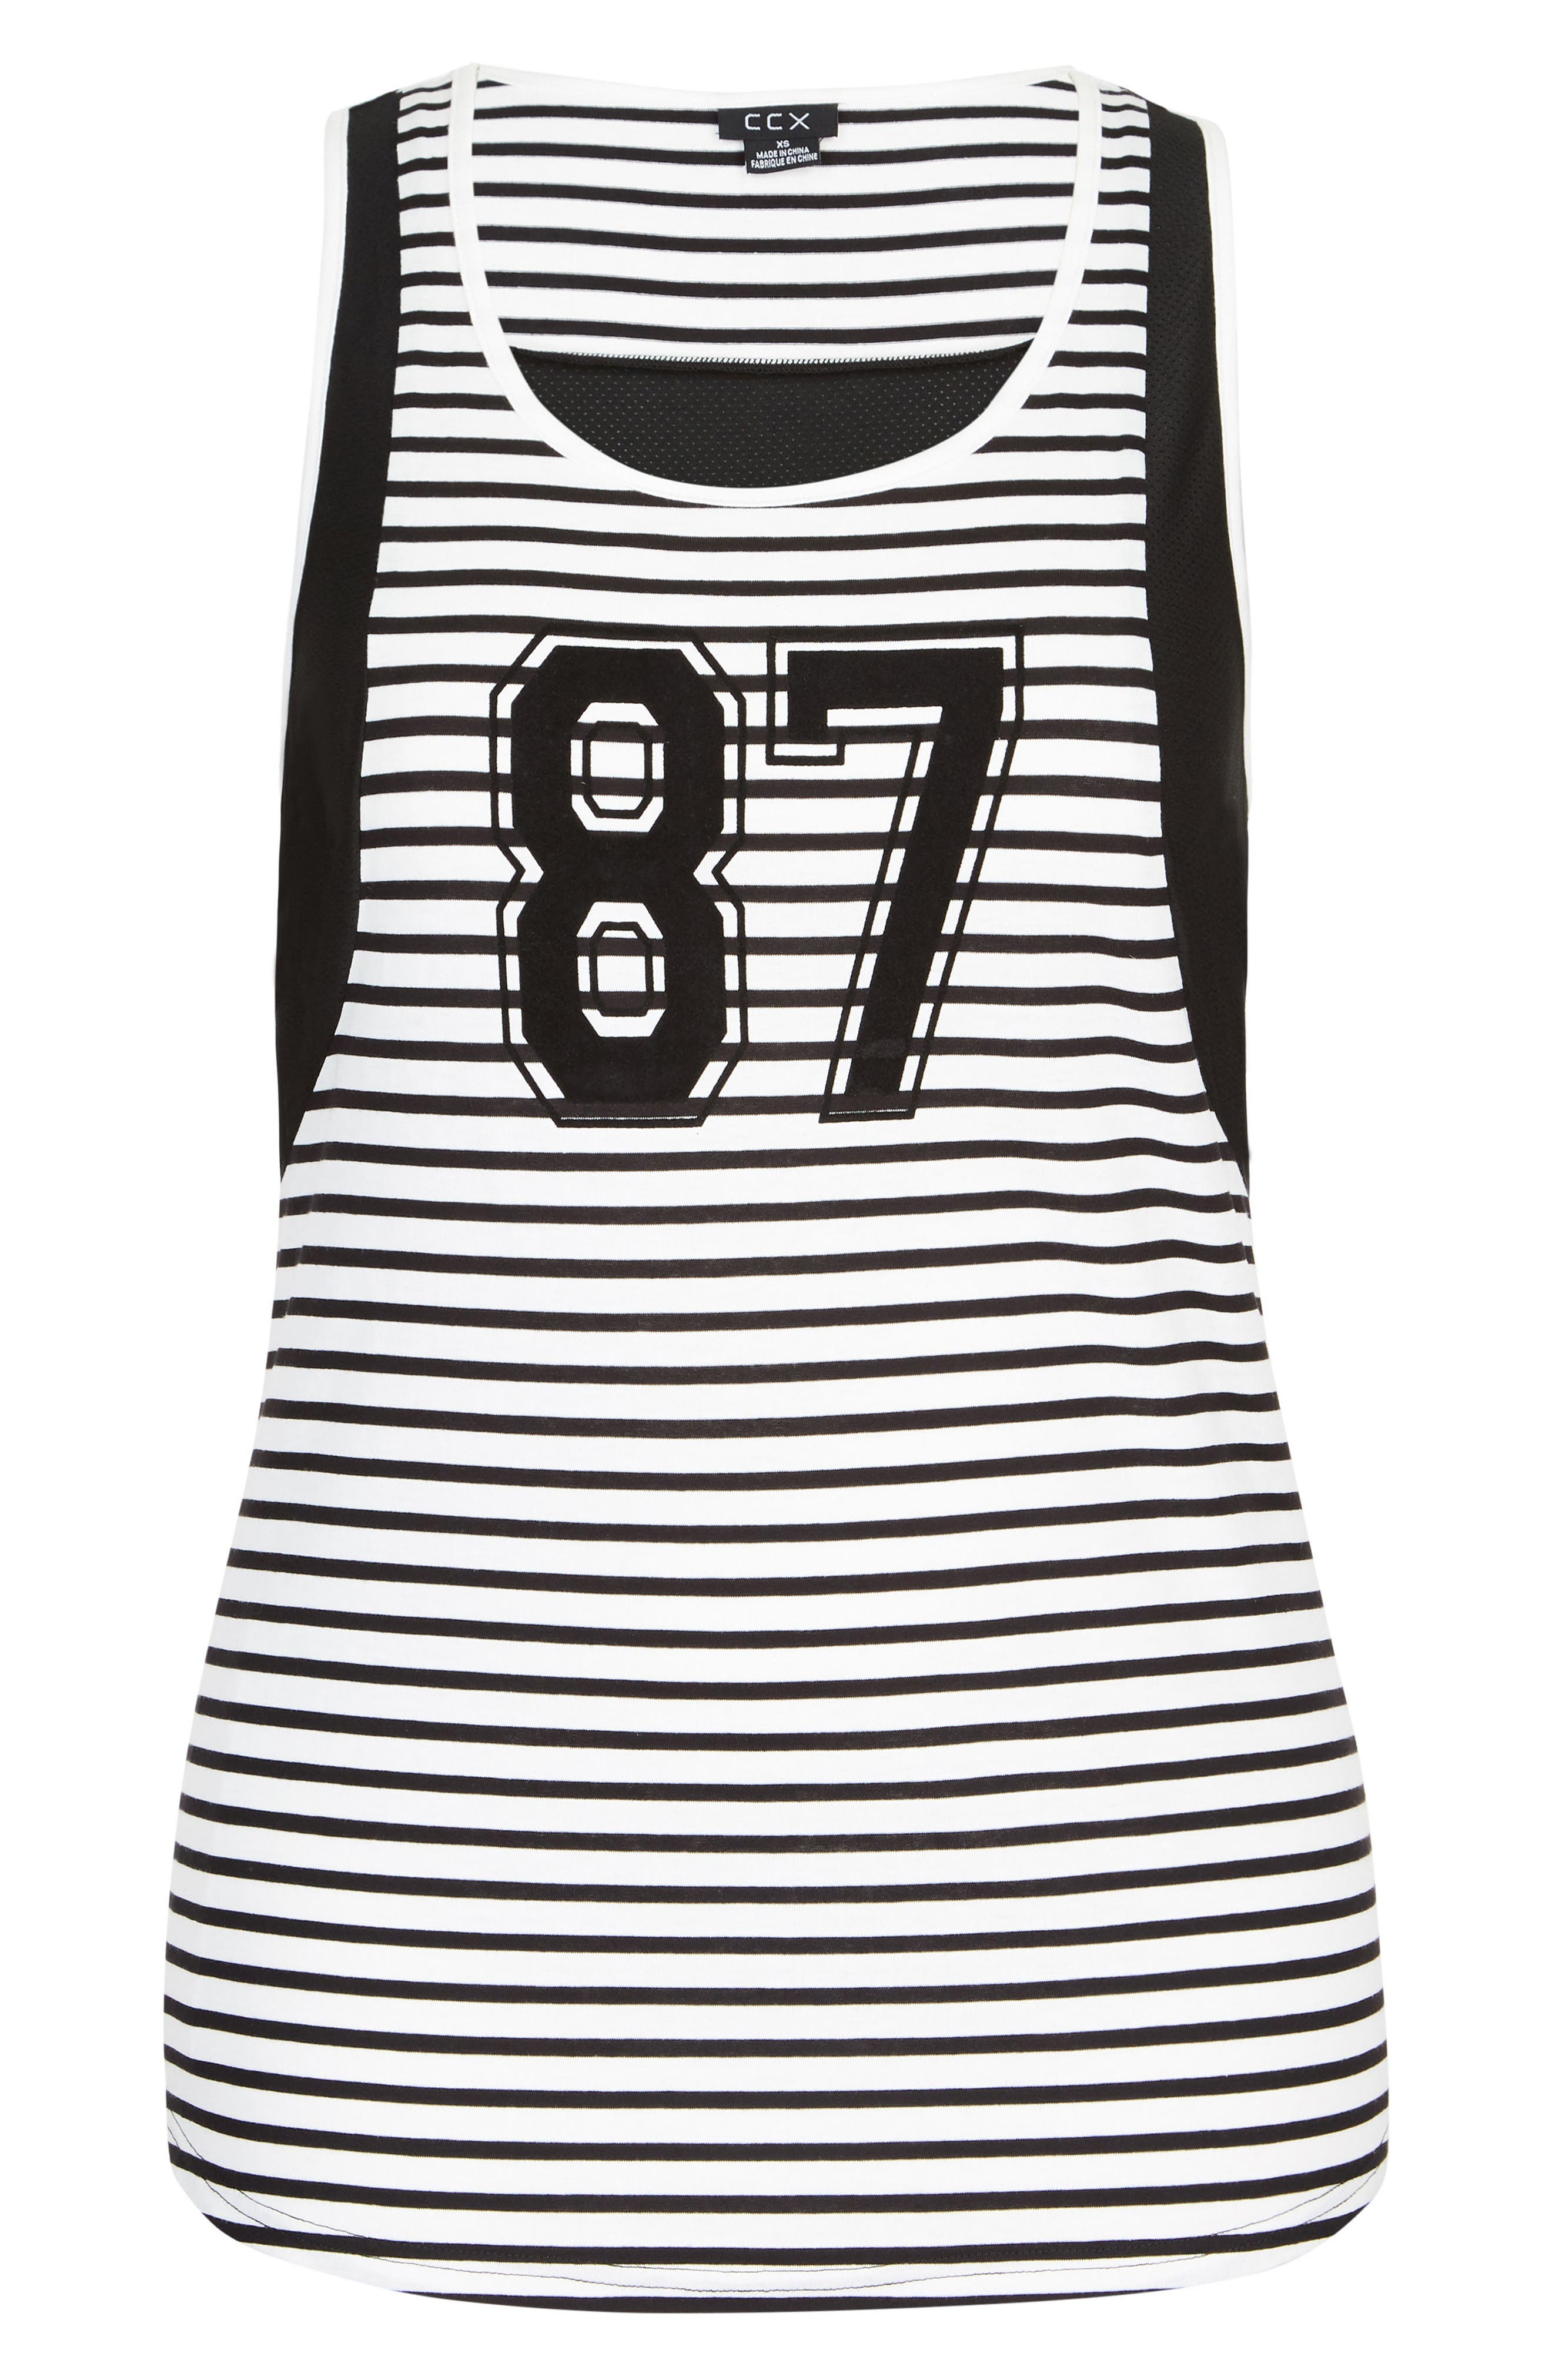 87 Stripe & Mesh Tank,                             Alternate thumbnail 3, color,                             Black/ White Stripe